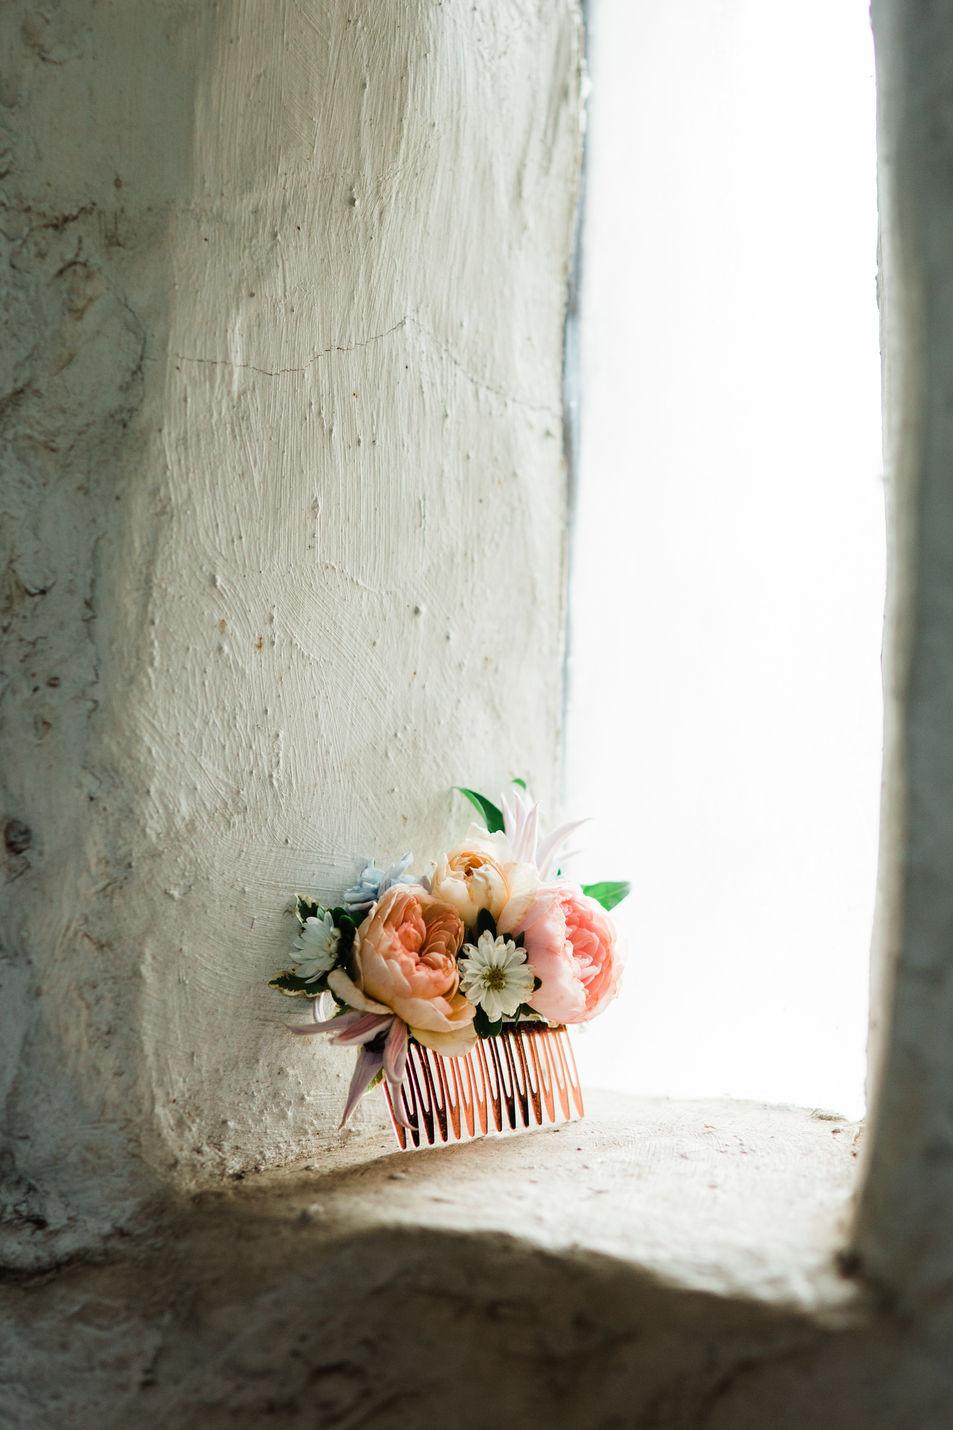 AmyGrayPhotography-2.jpg